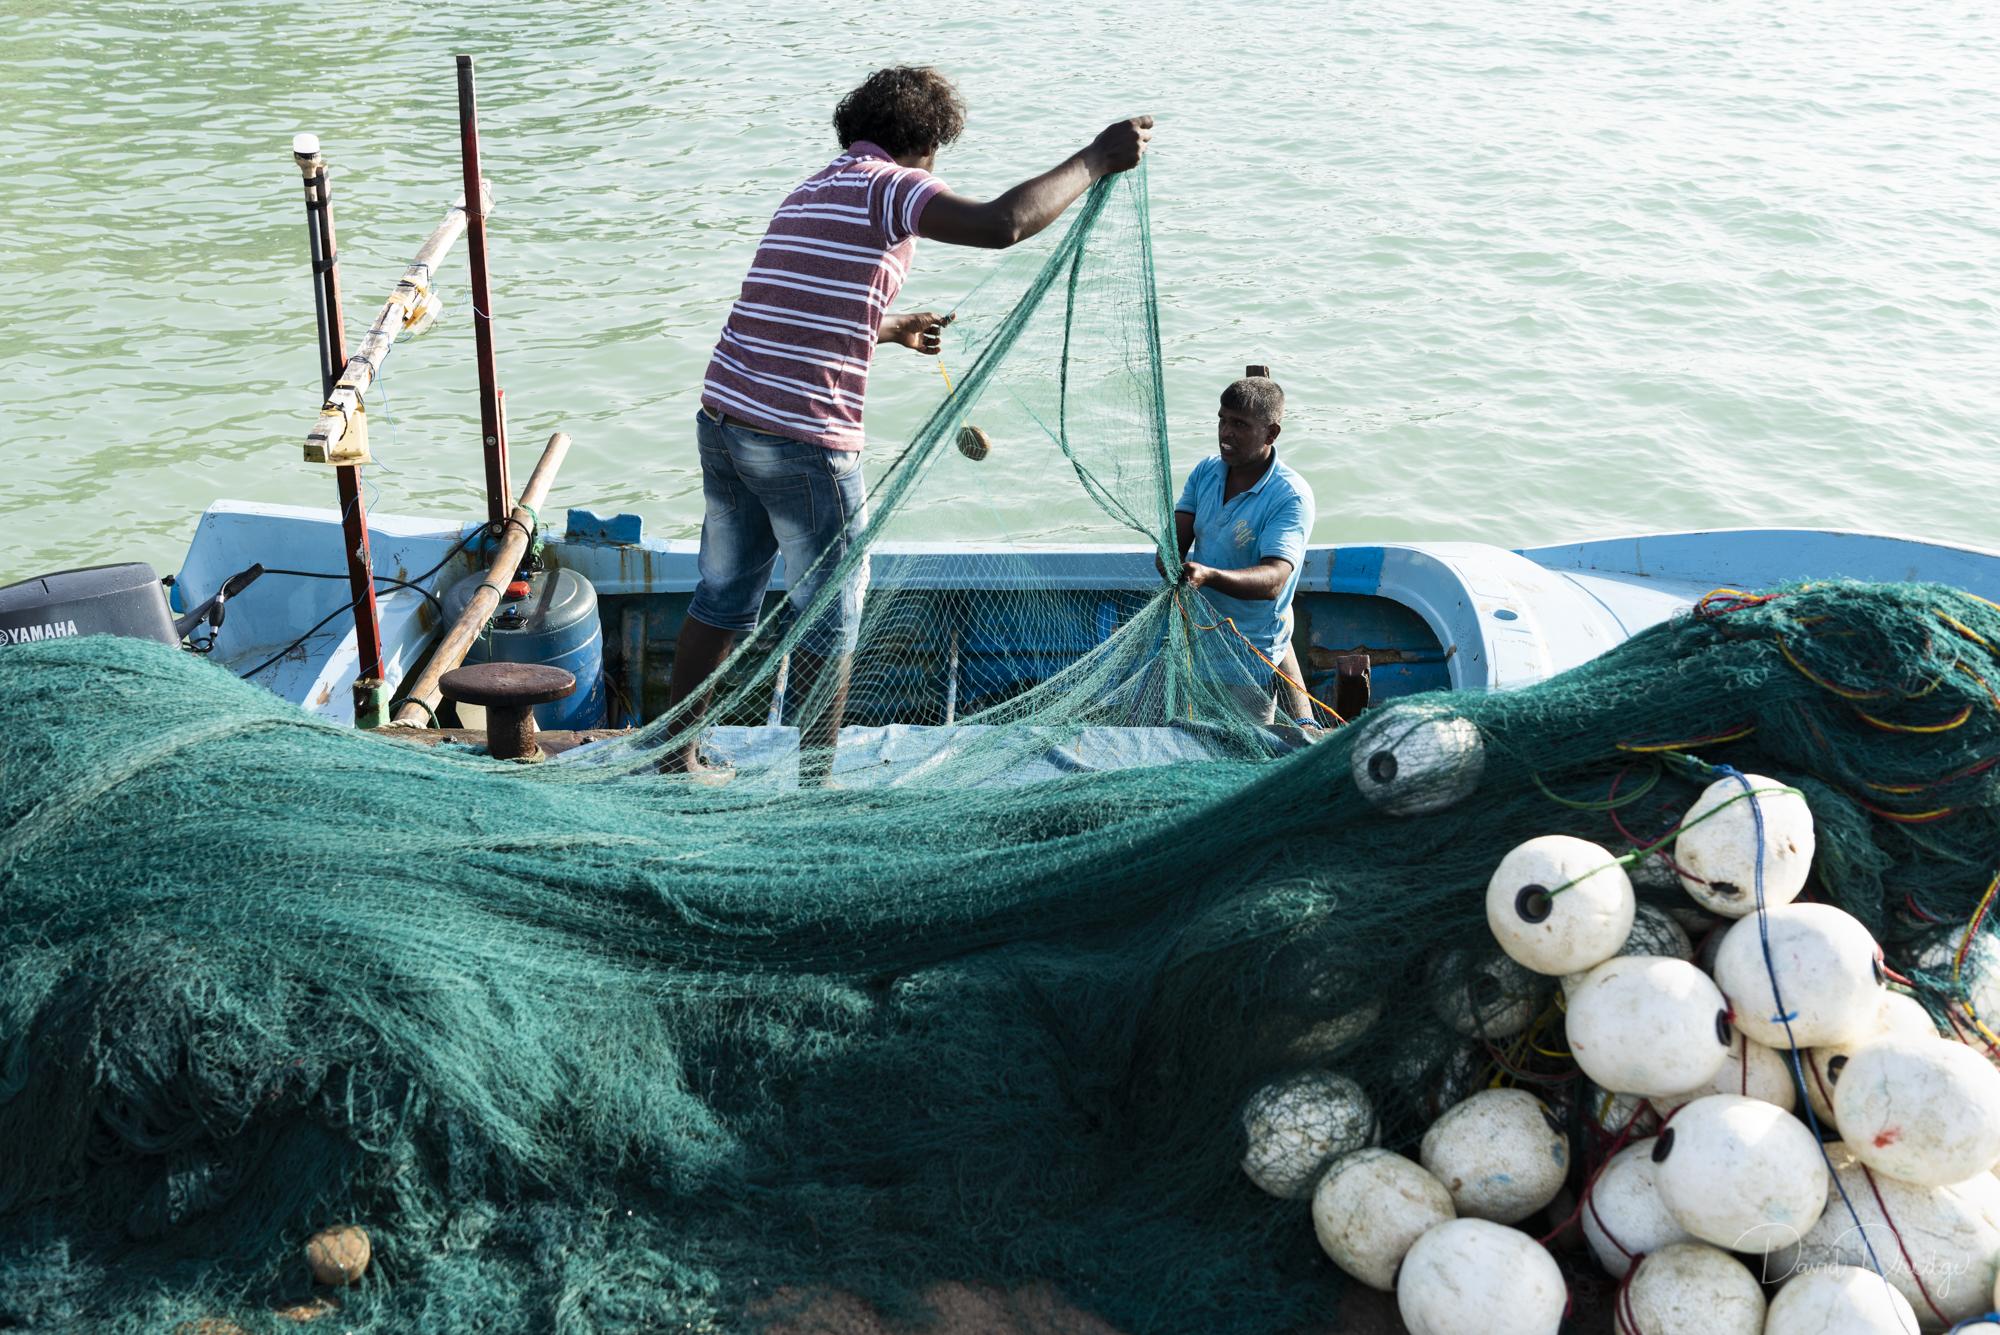 fishermen with fishing net